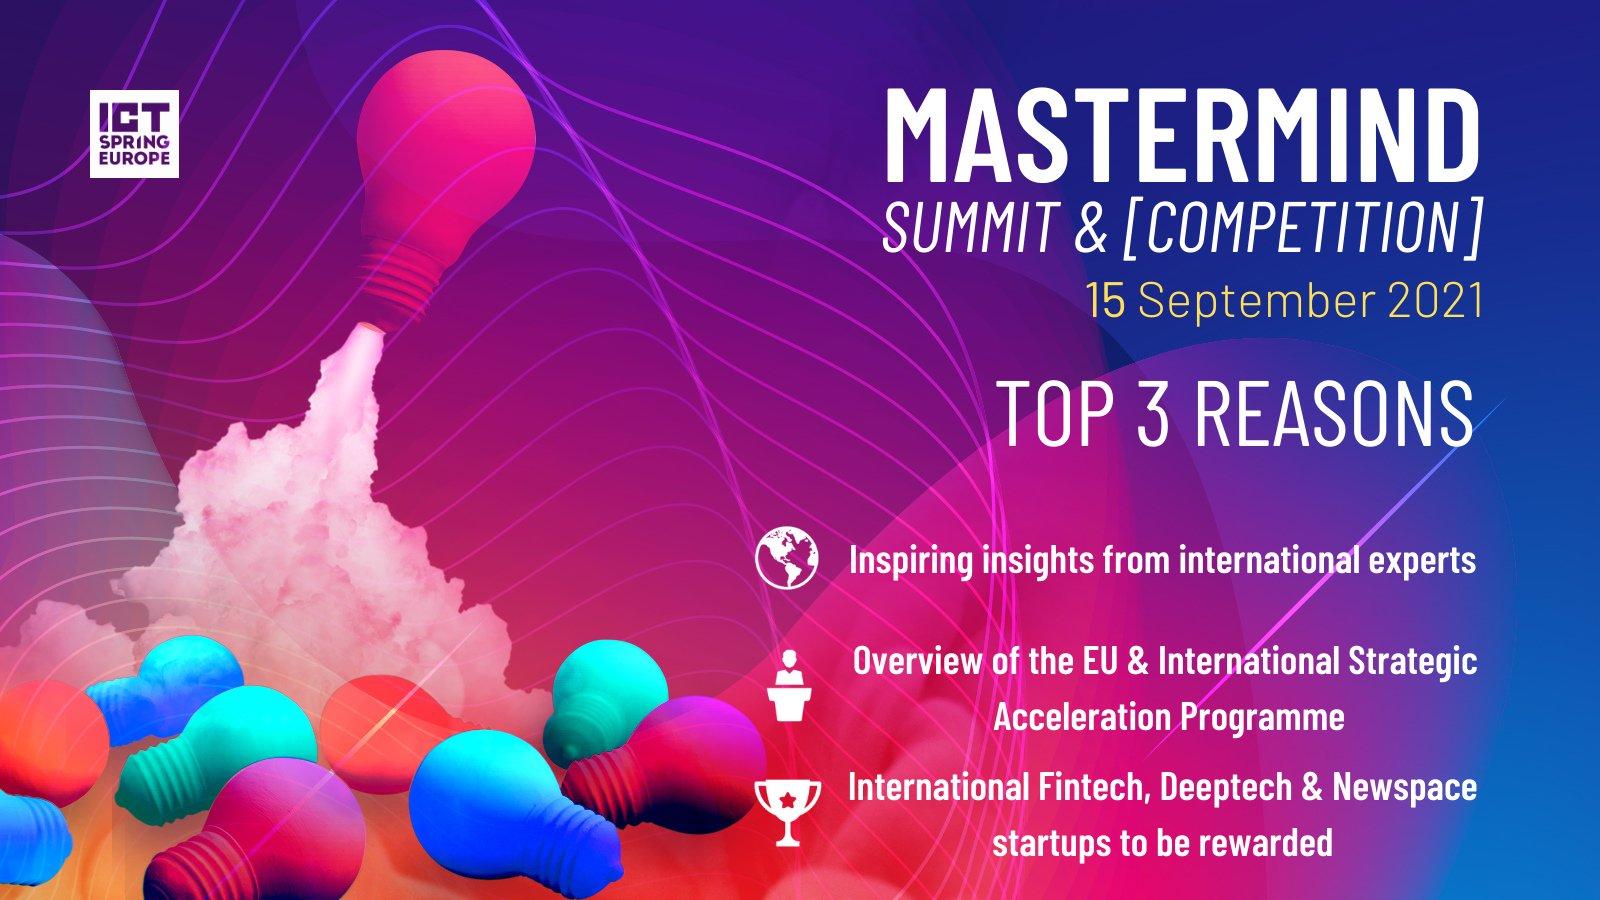 Mastermind Competition & Summit 2021